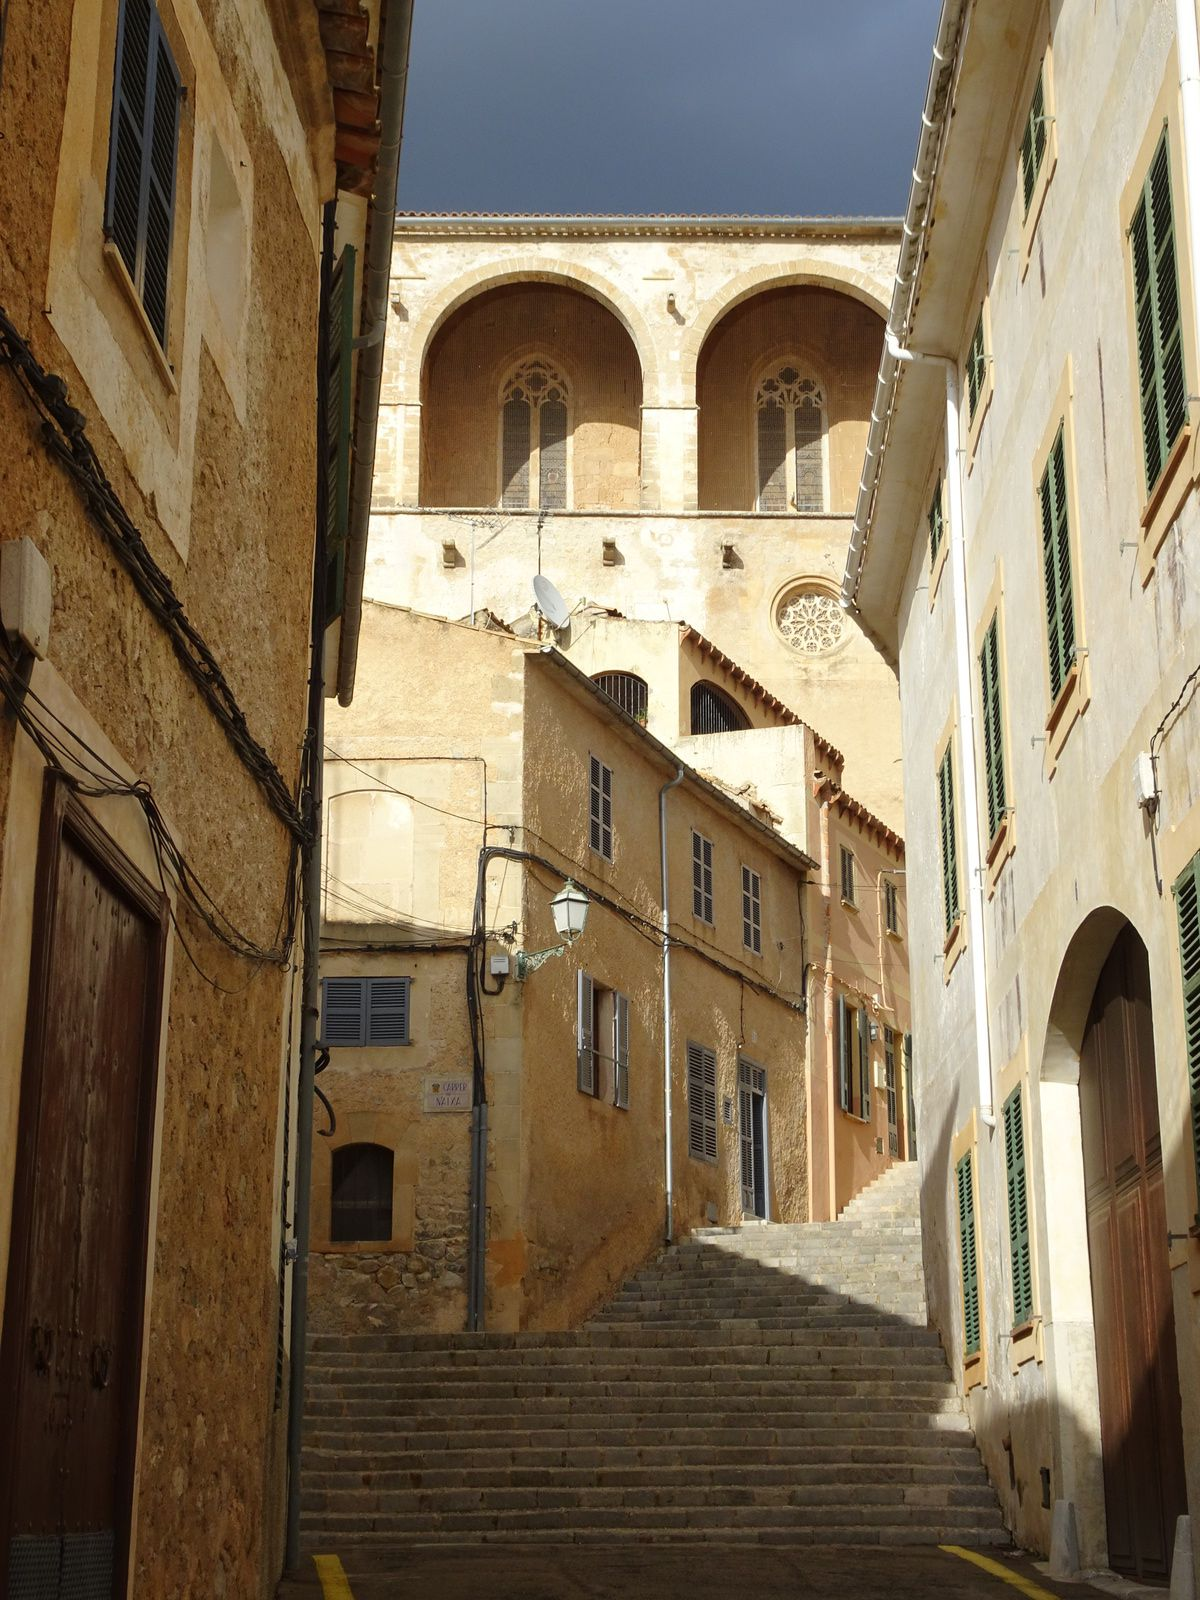 La péninsule de Formentor - la ville d'Arta